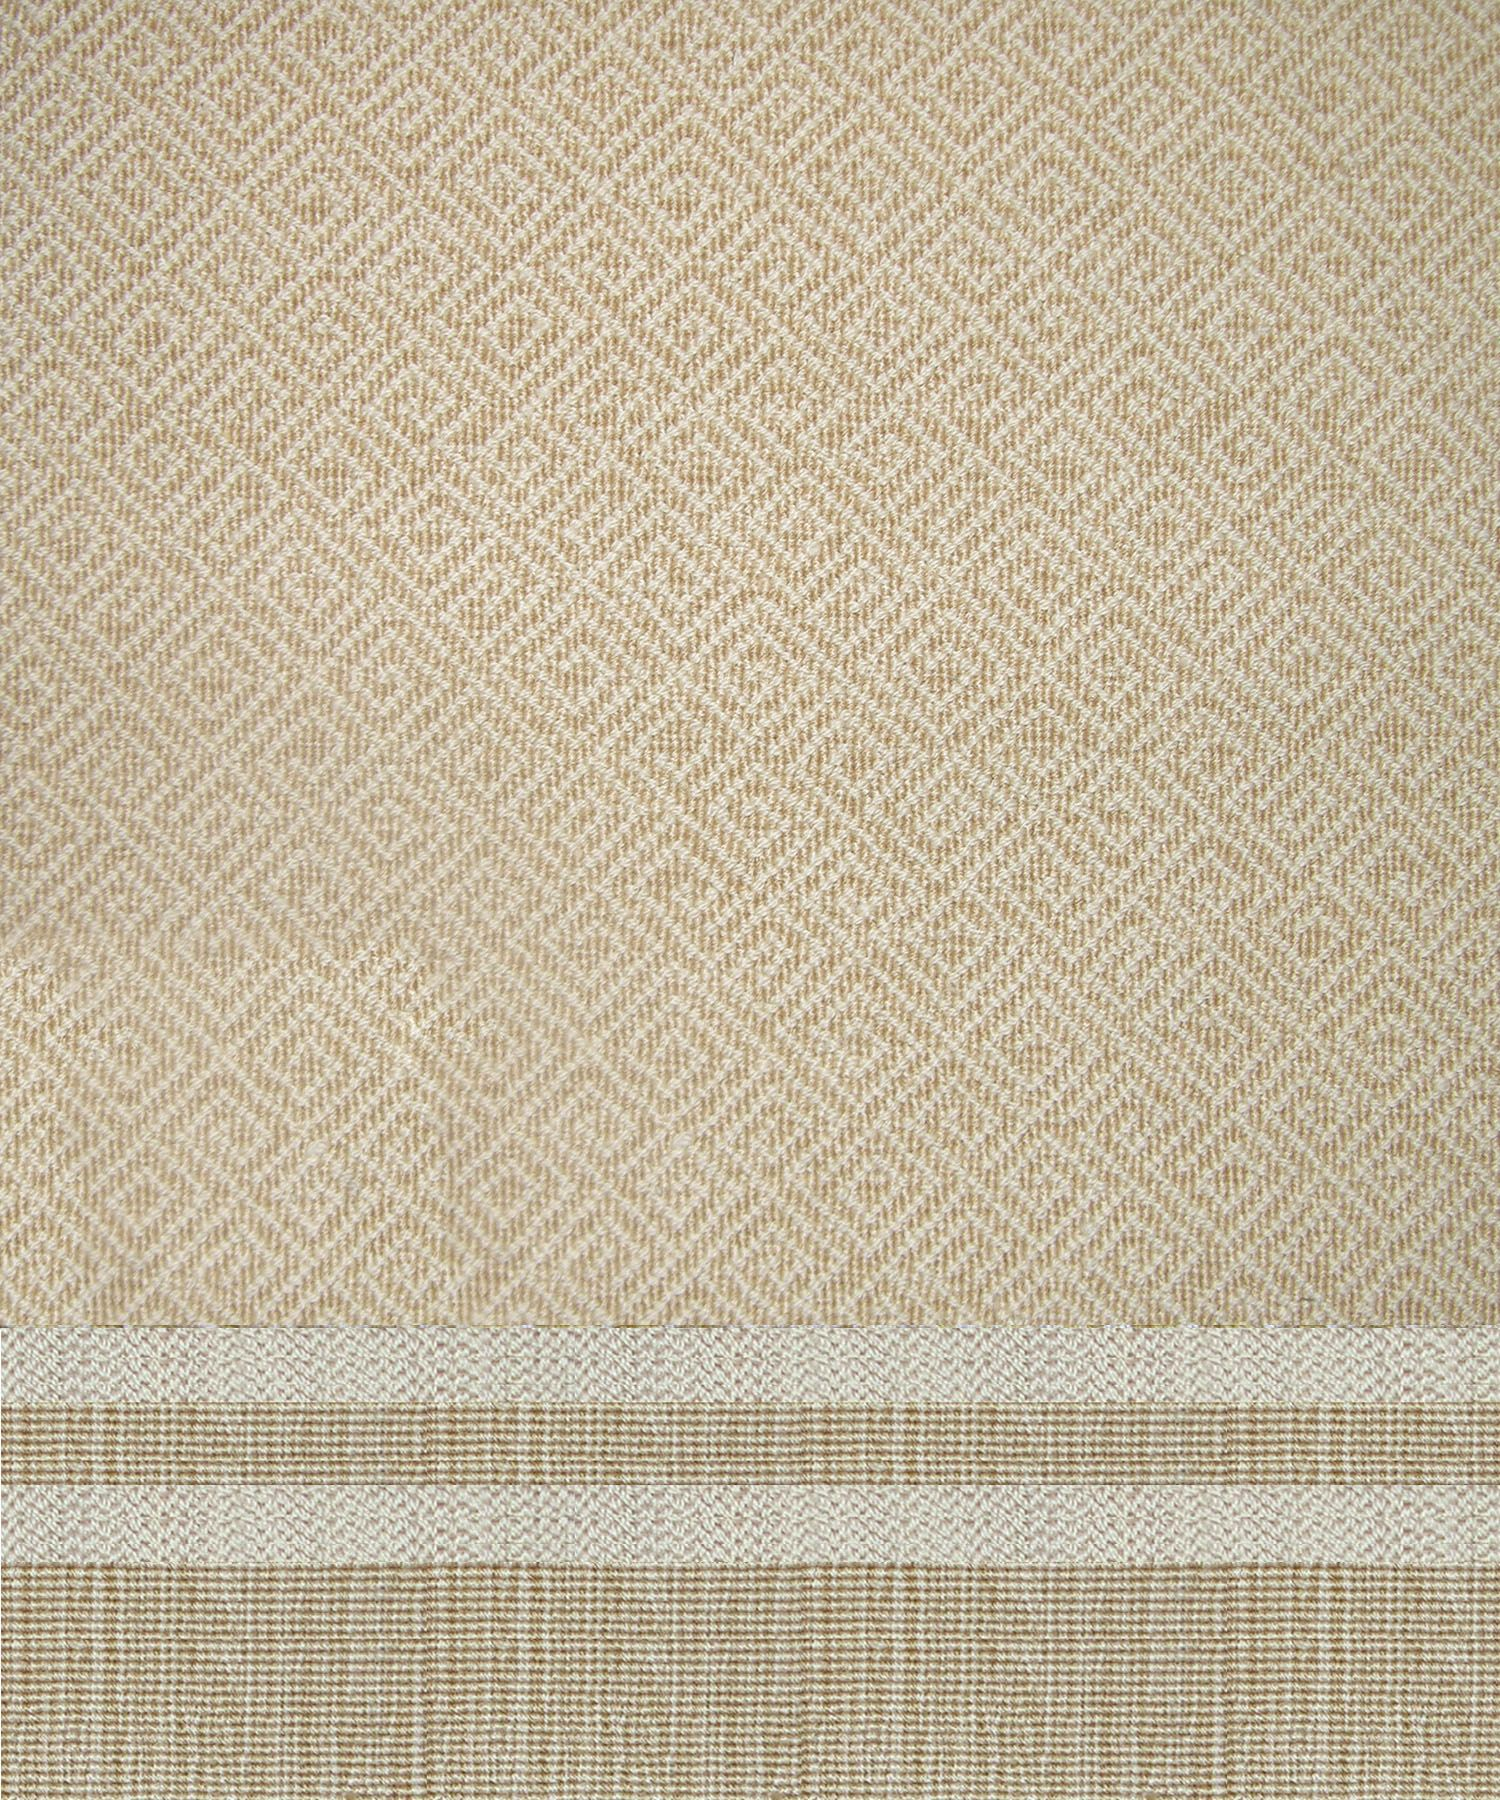 com nj sale antelope tx price morristown dallas rug rugs stark cintronbeveragegroup carpet